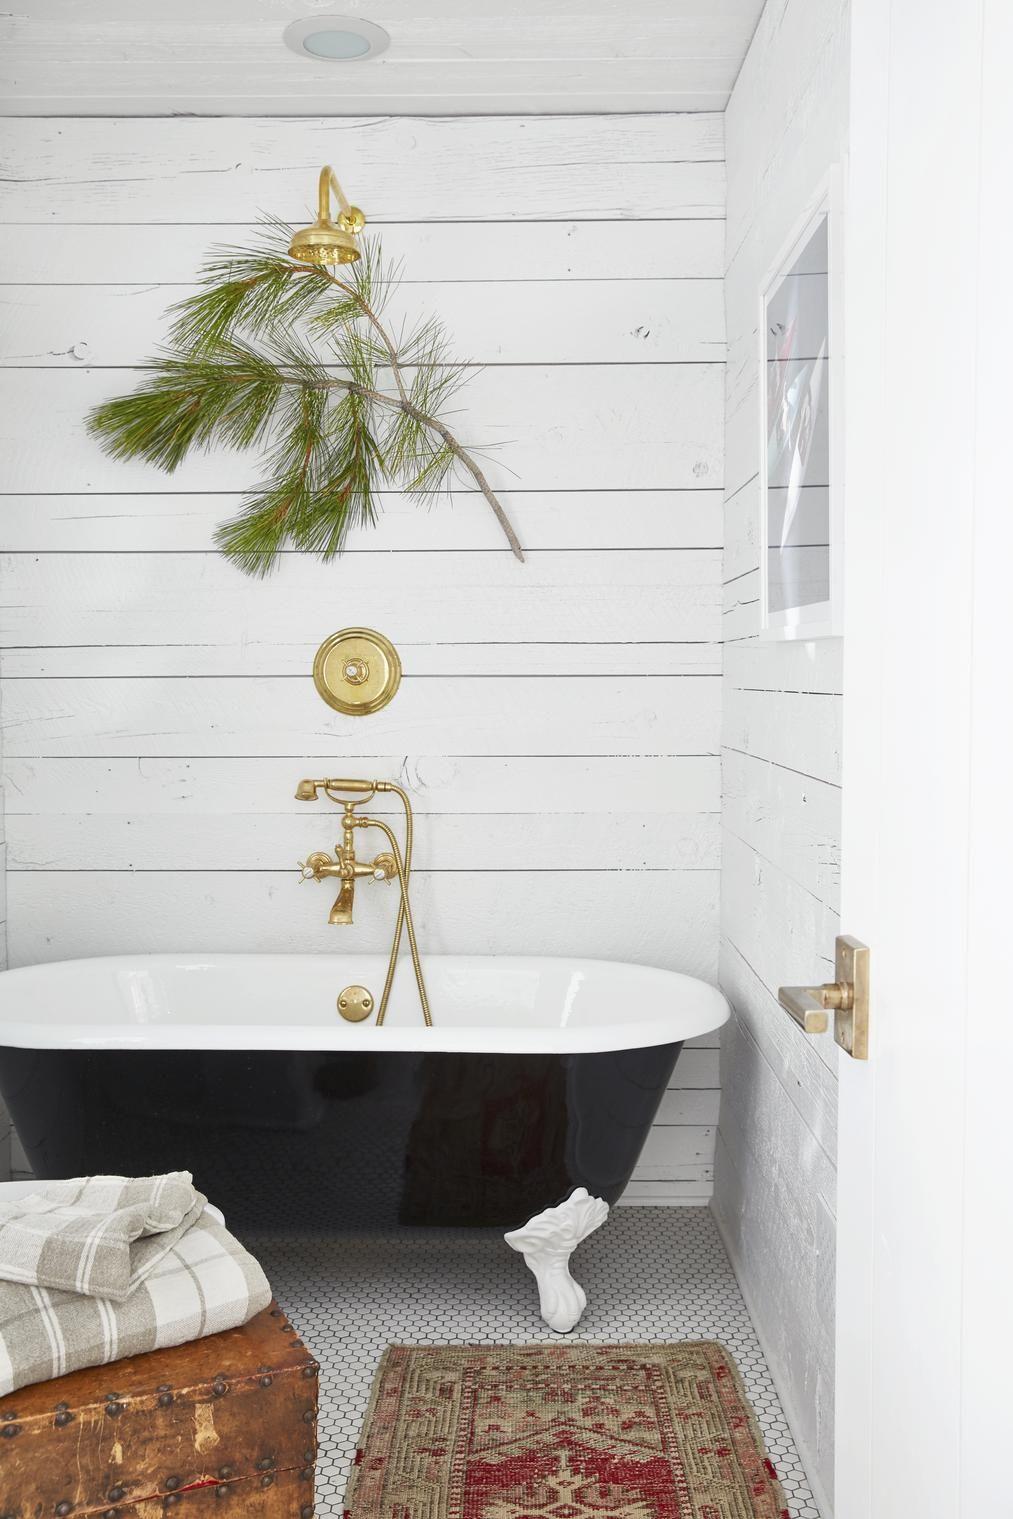 47 Rustic Bathroom Decor Ideas - Rustic Modern Bathroom Designs